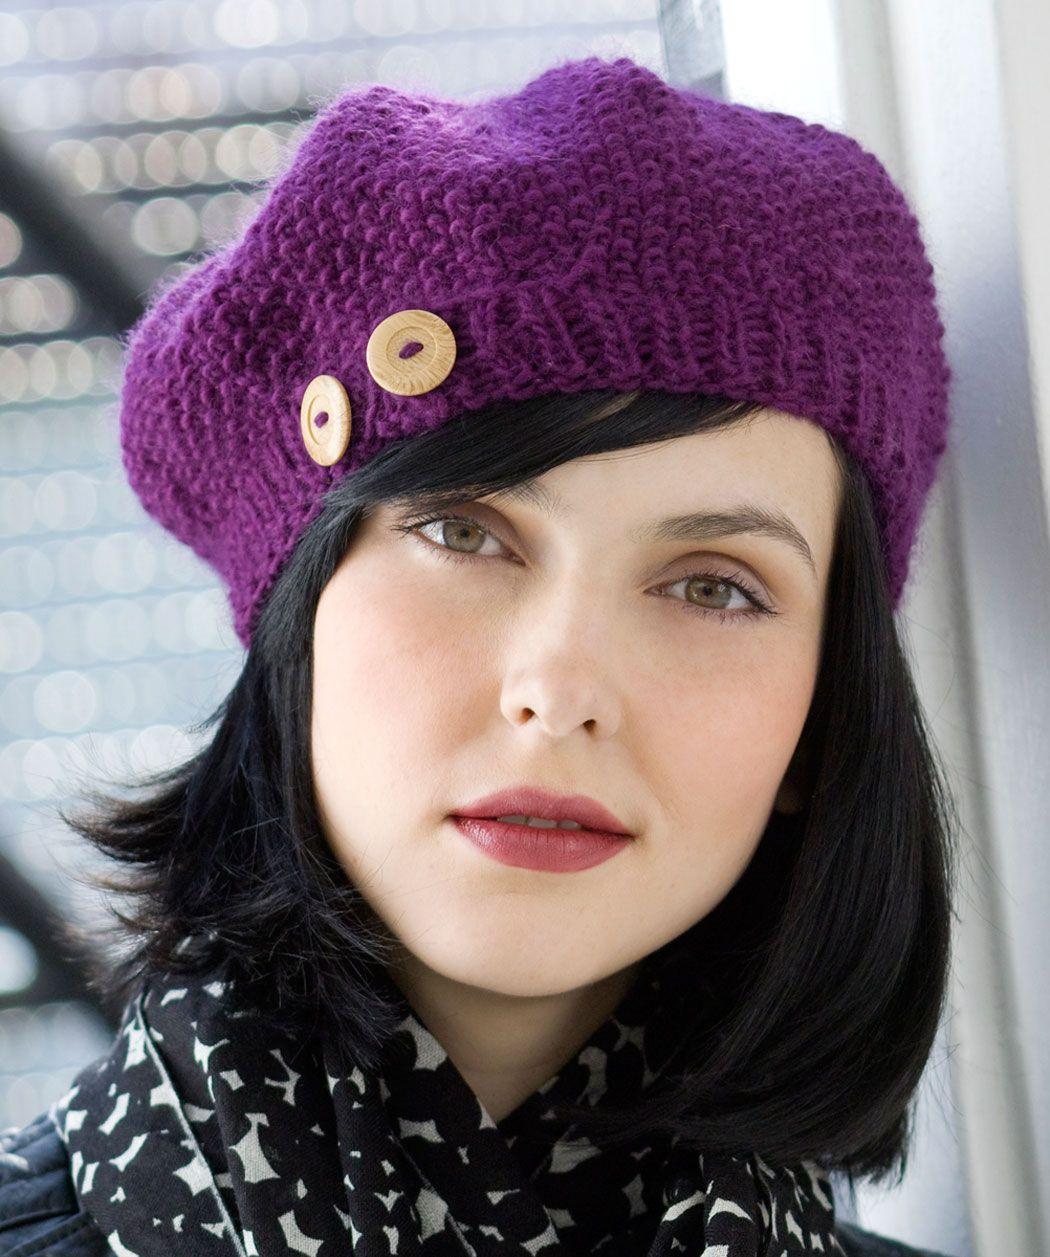 Buttoned beret melissa shears knit pinterest berets buttoned beret melissa shears knitting patterns bankloansurffo Images